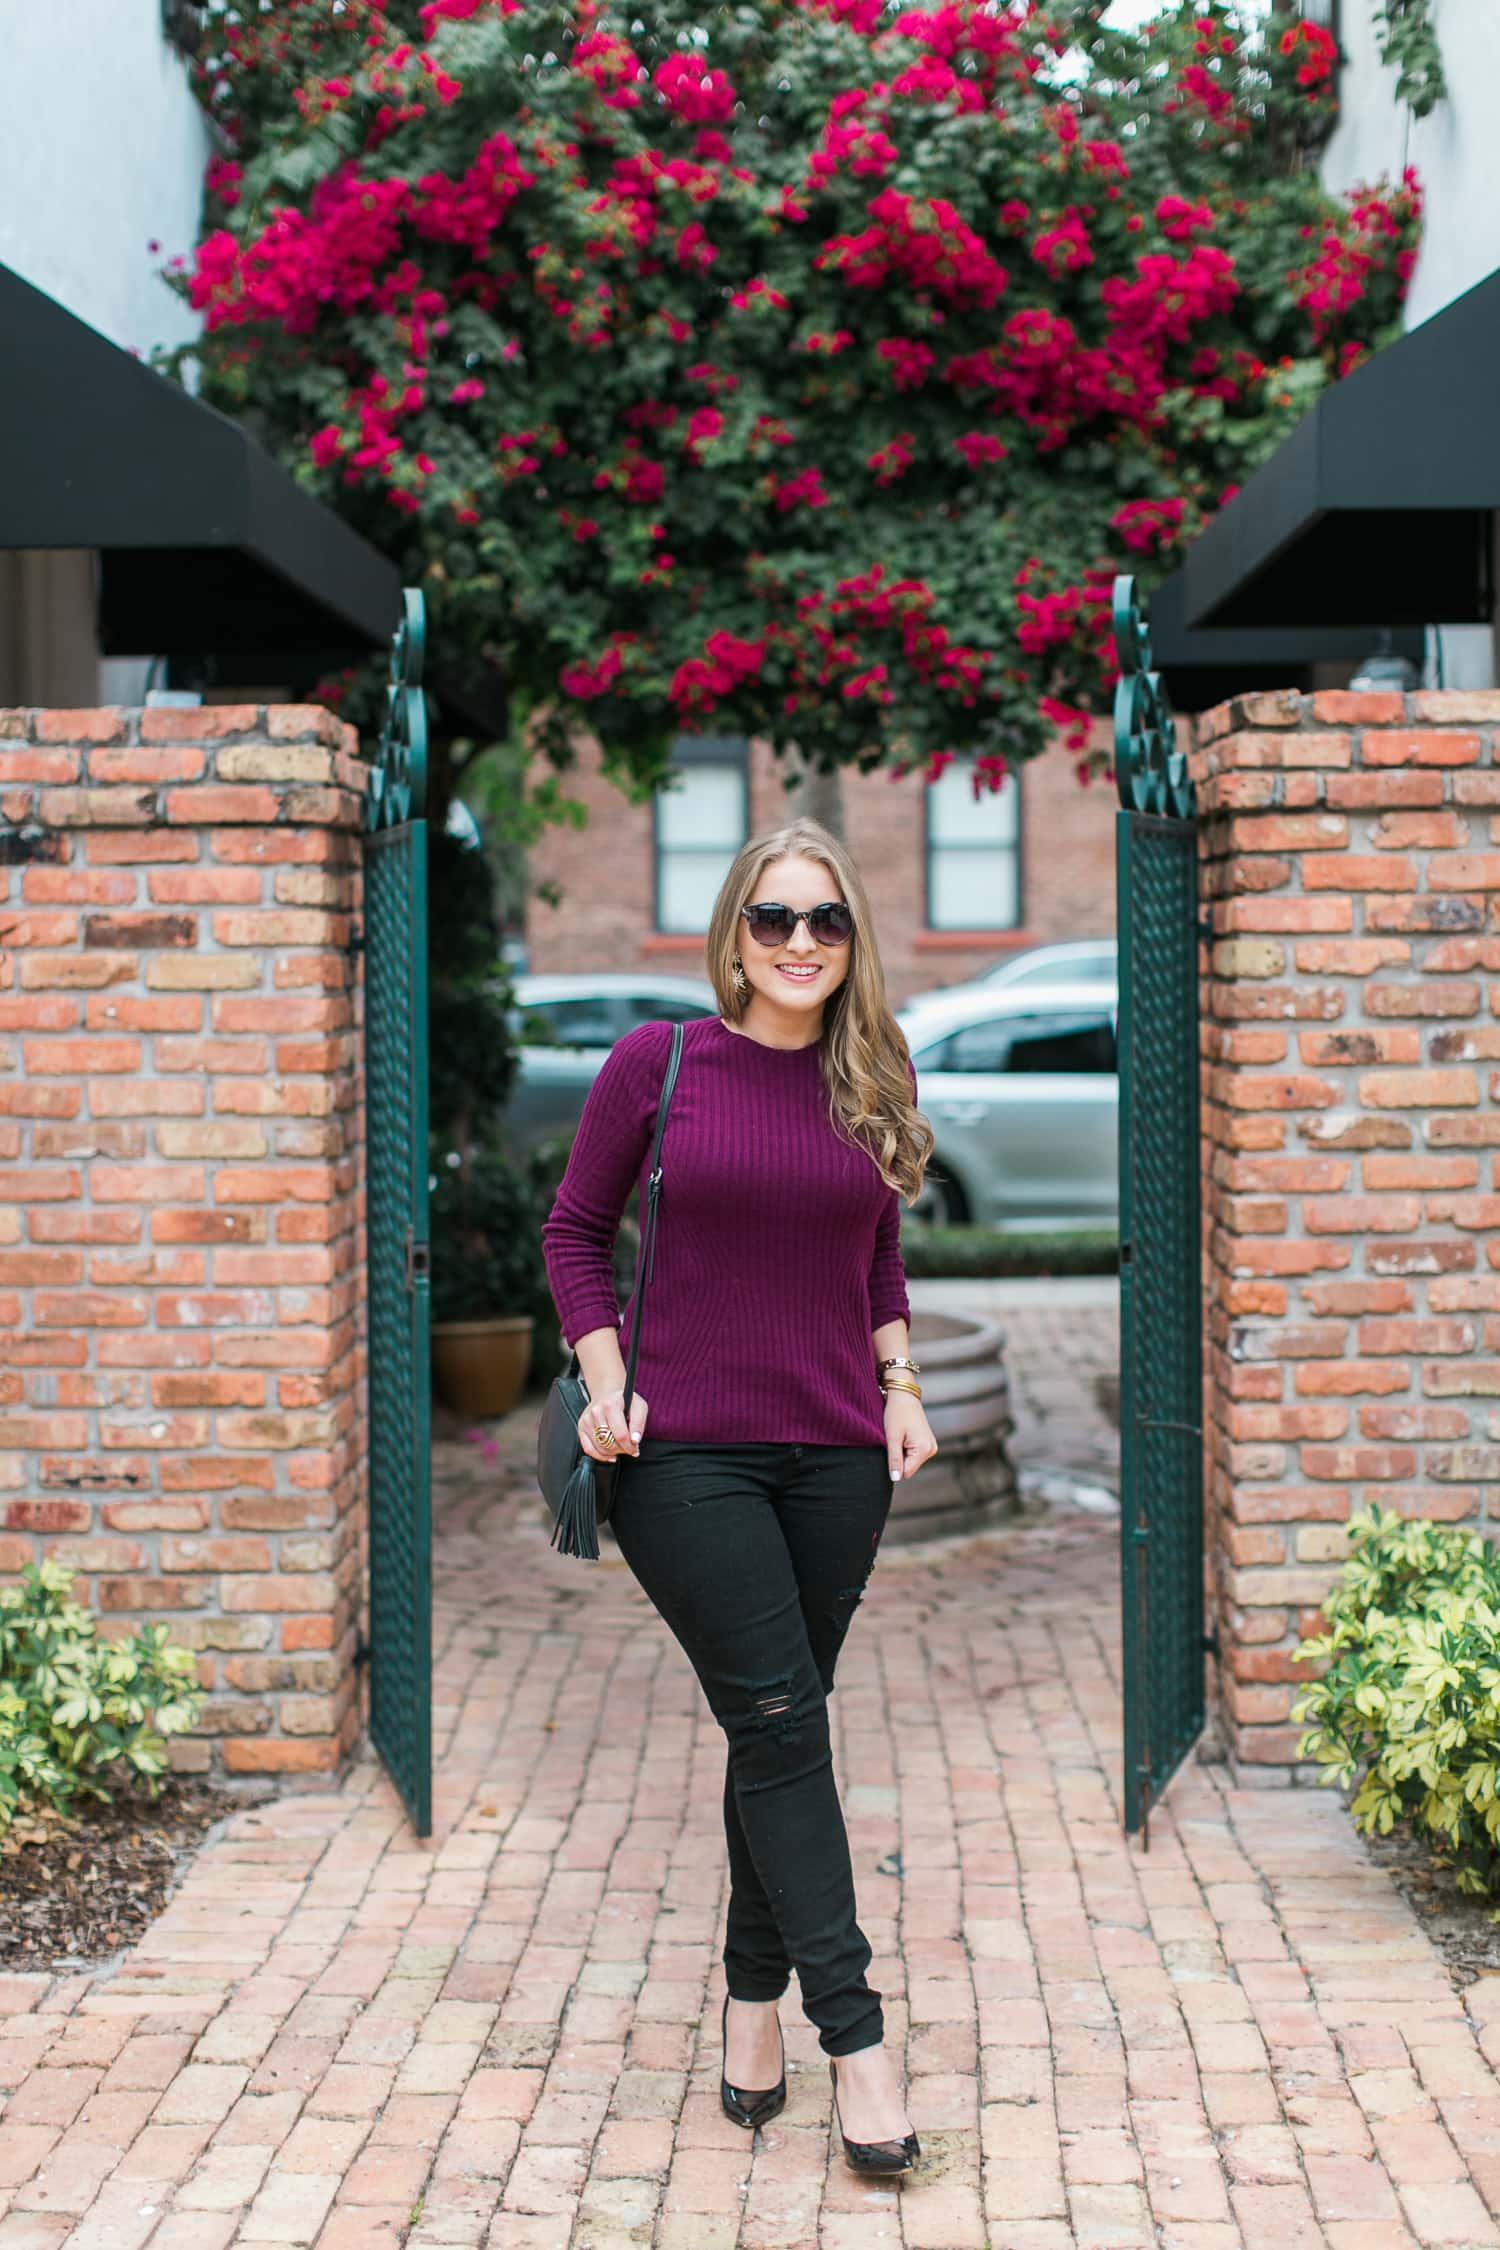 black-ripped-jeans-retro-round-sunglasses-burgundy-cashmere-sweater-black-pointy-toe-pumps-tassel-handbag-005